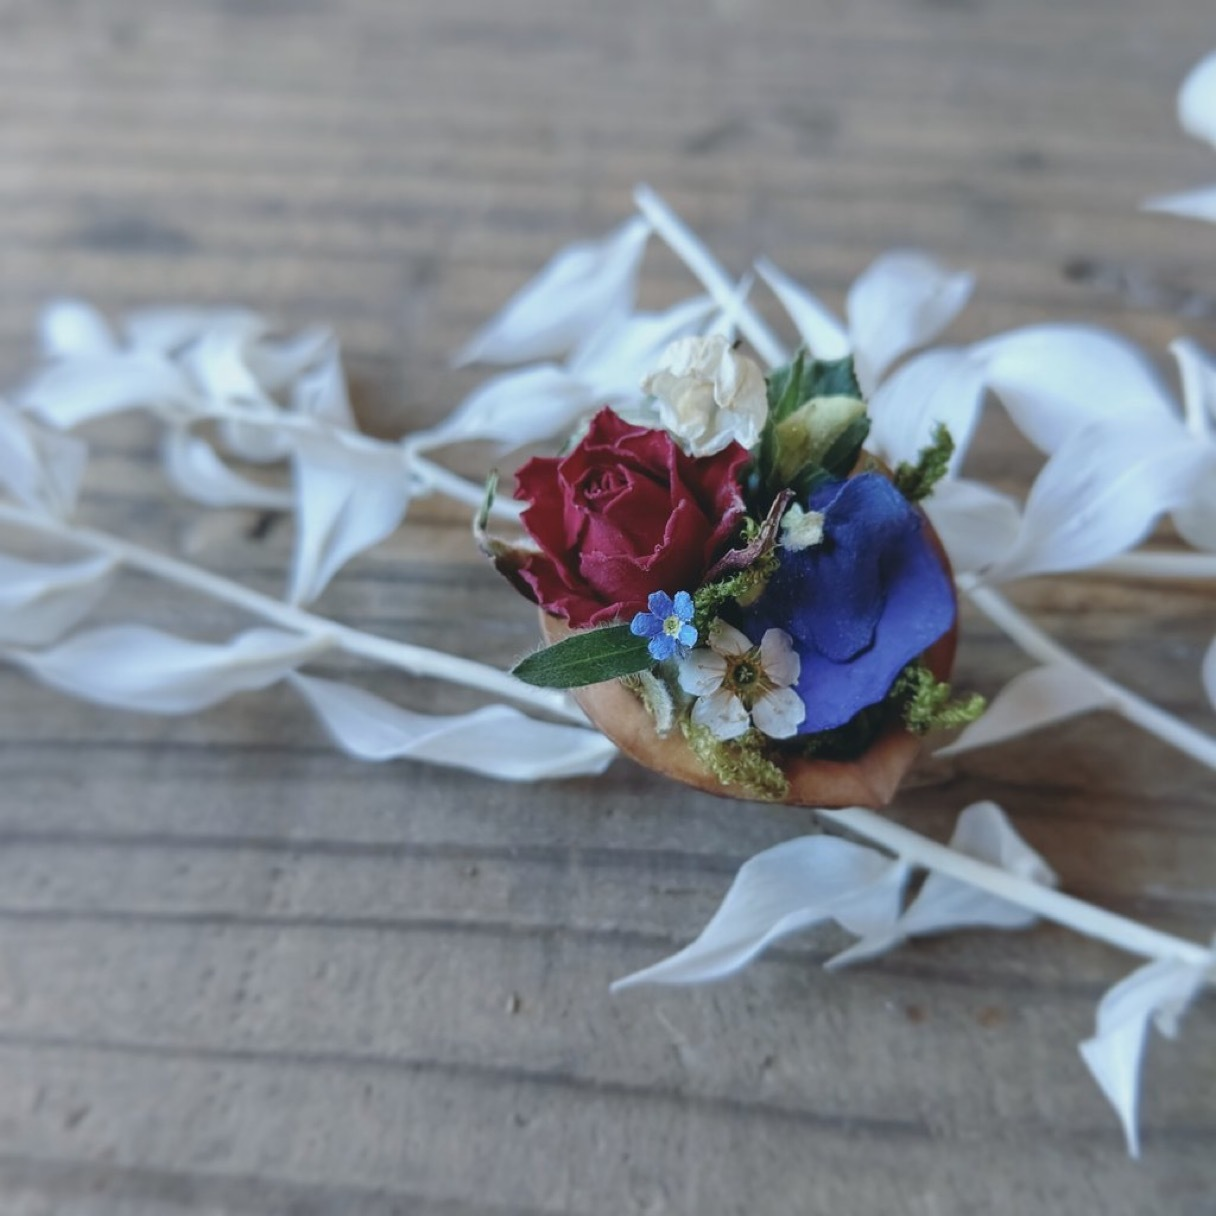 kokohanaさんのお部屋 💐アンデルセンの物語を花に寄せて_c0203401_22310526.jpeg